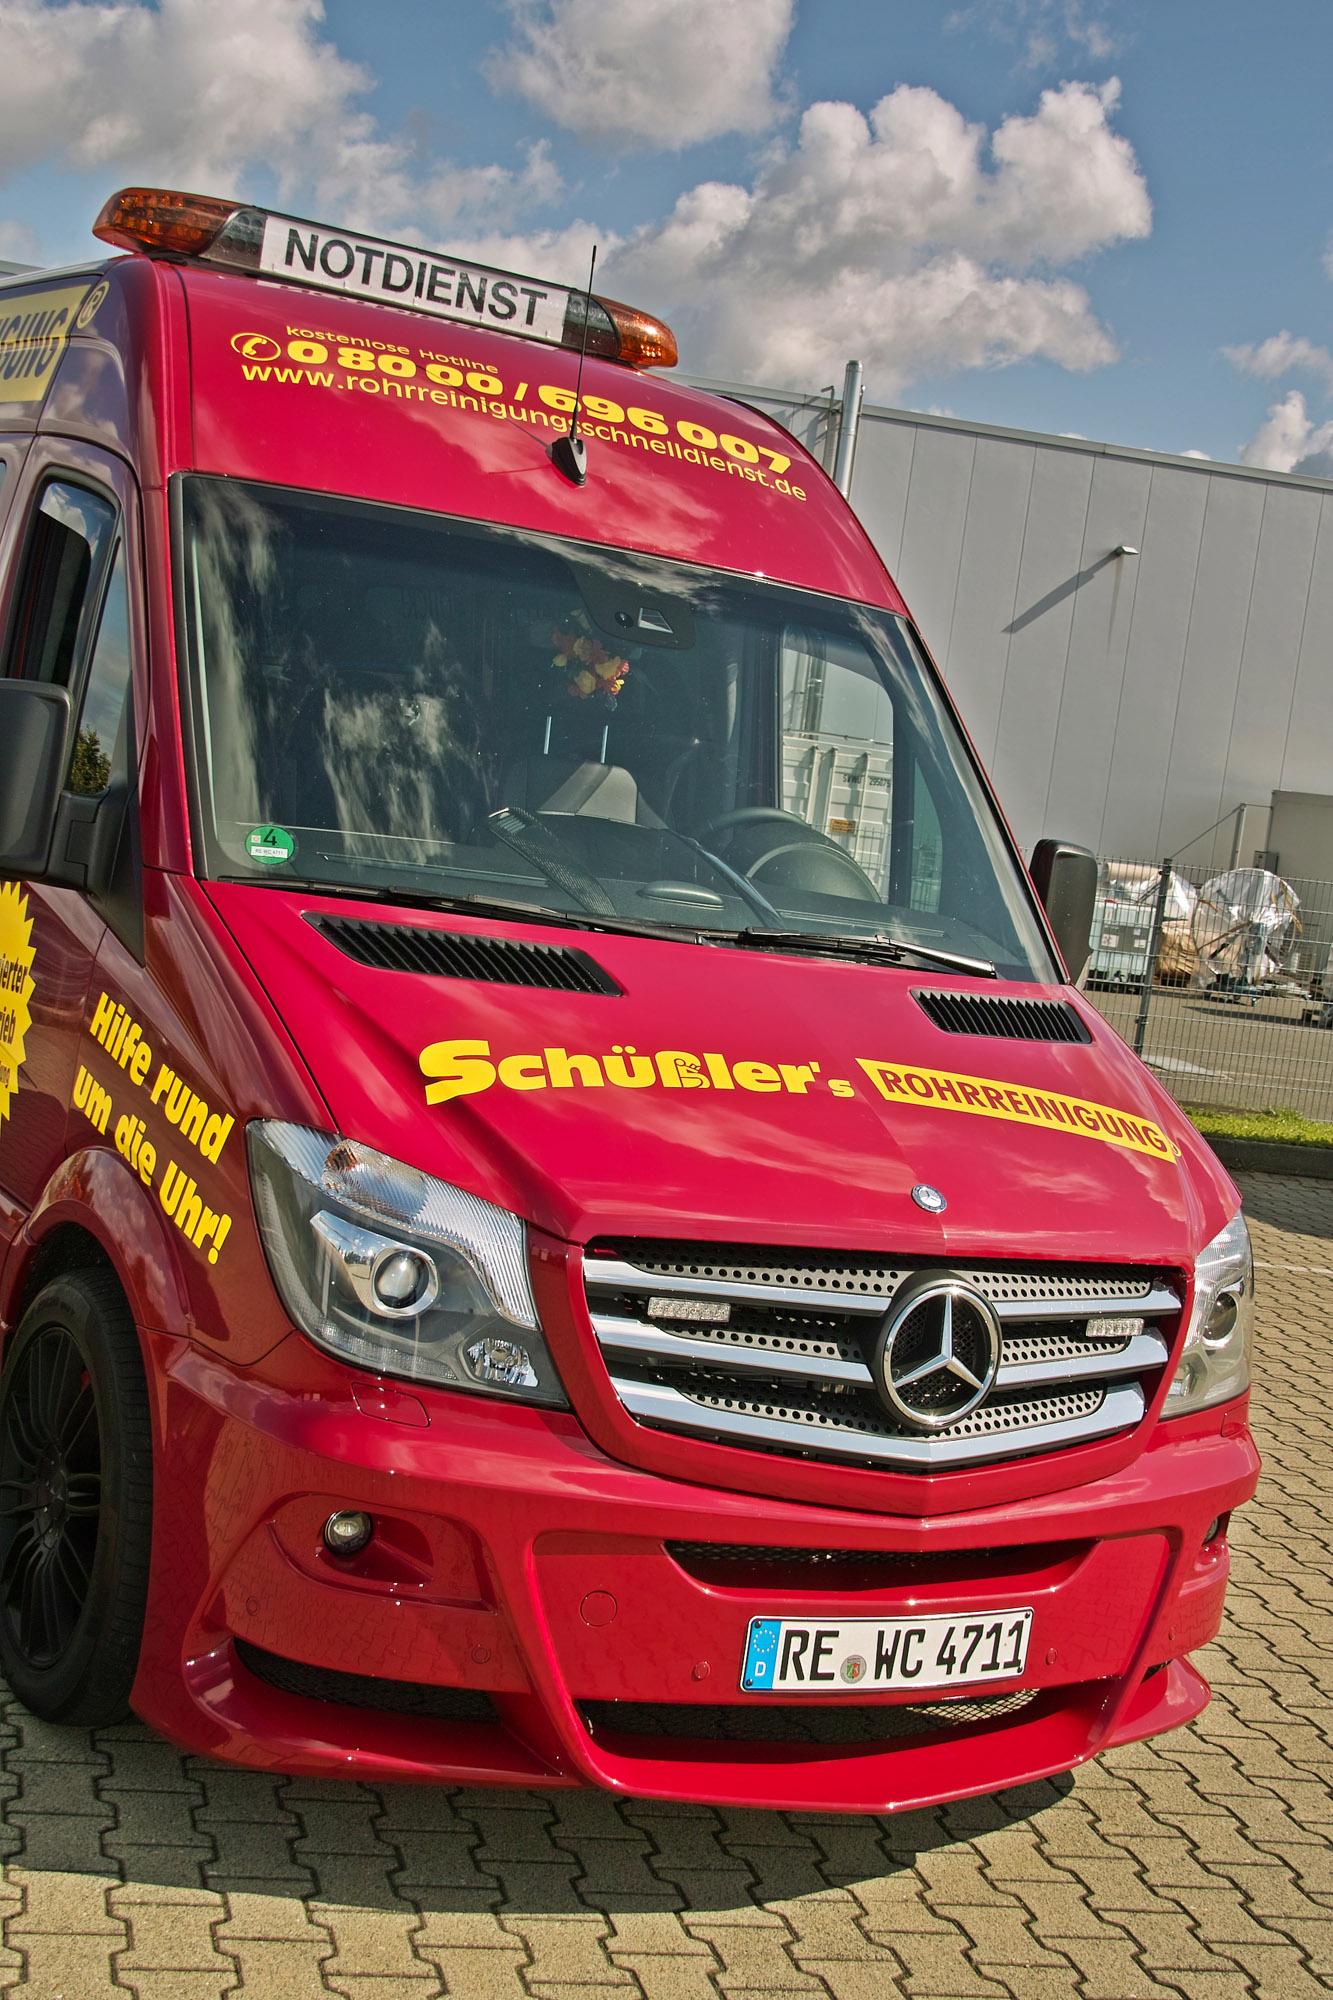 2014 Hartmann Mercedes-Benz Sprinter 319 CDI - HD Pictures